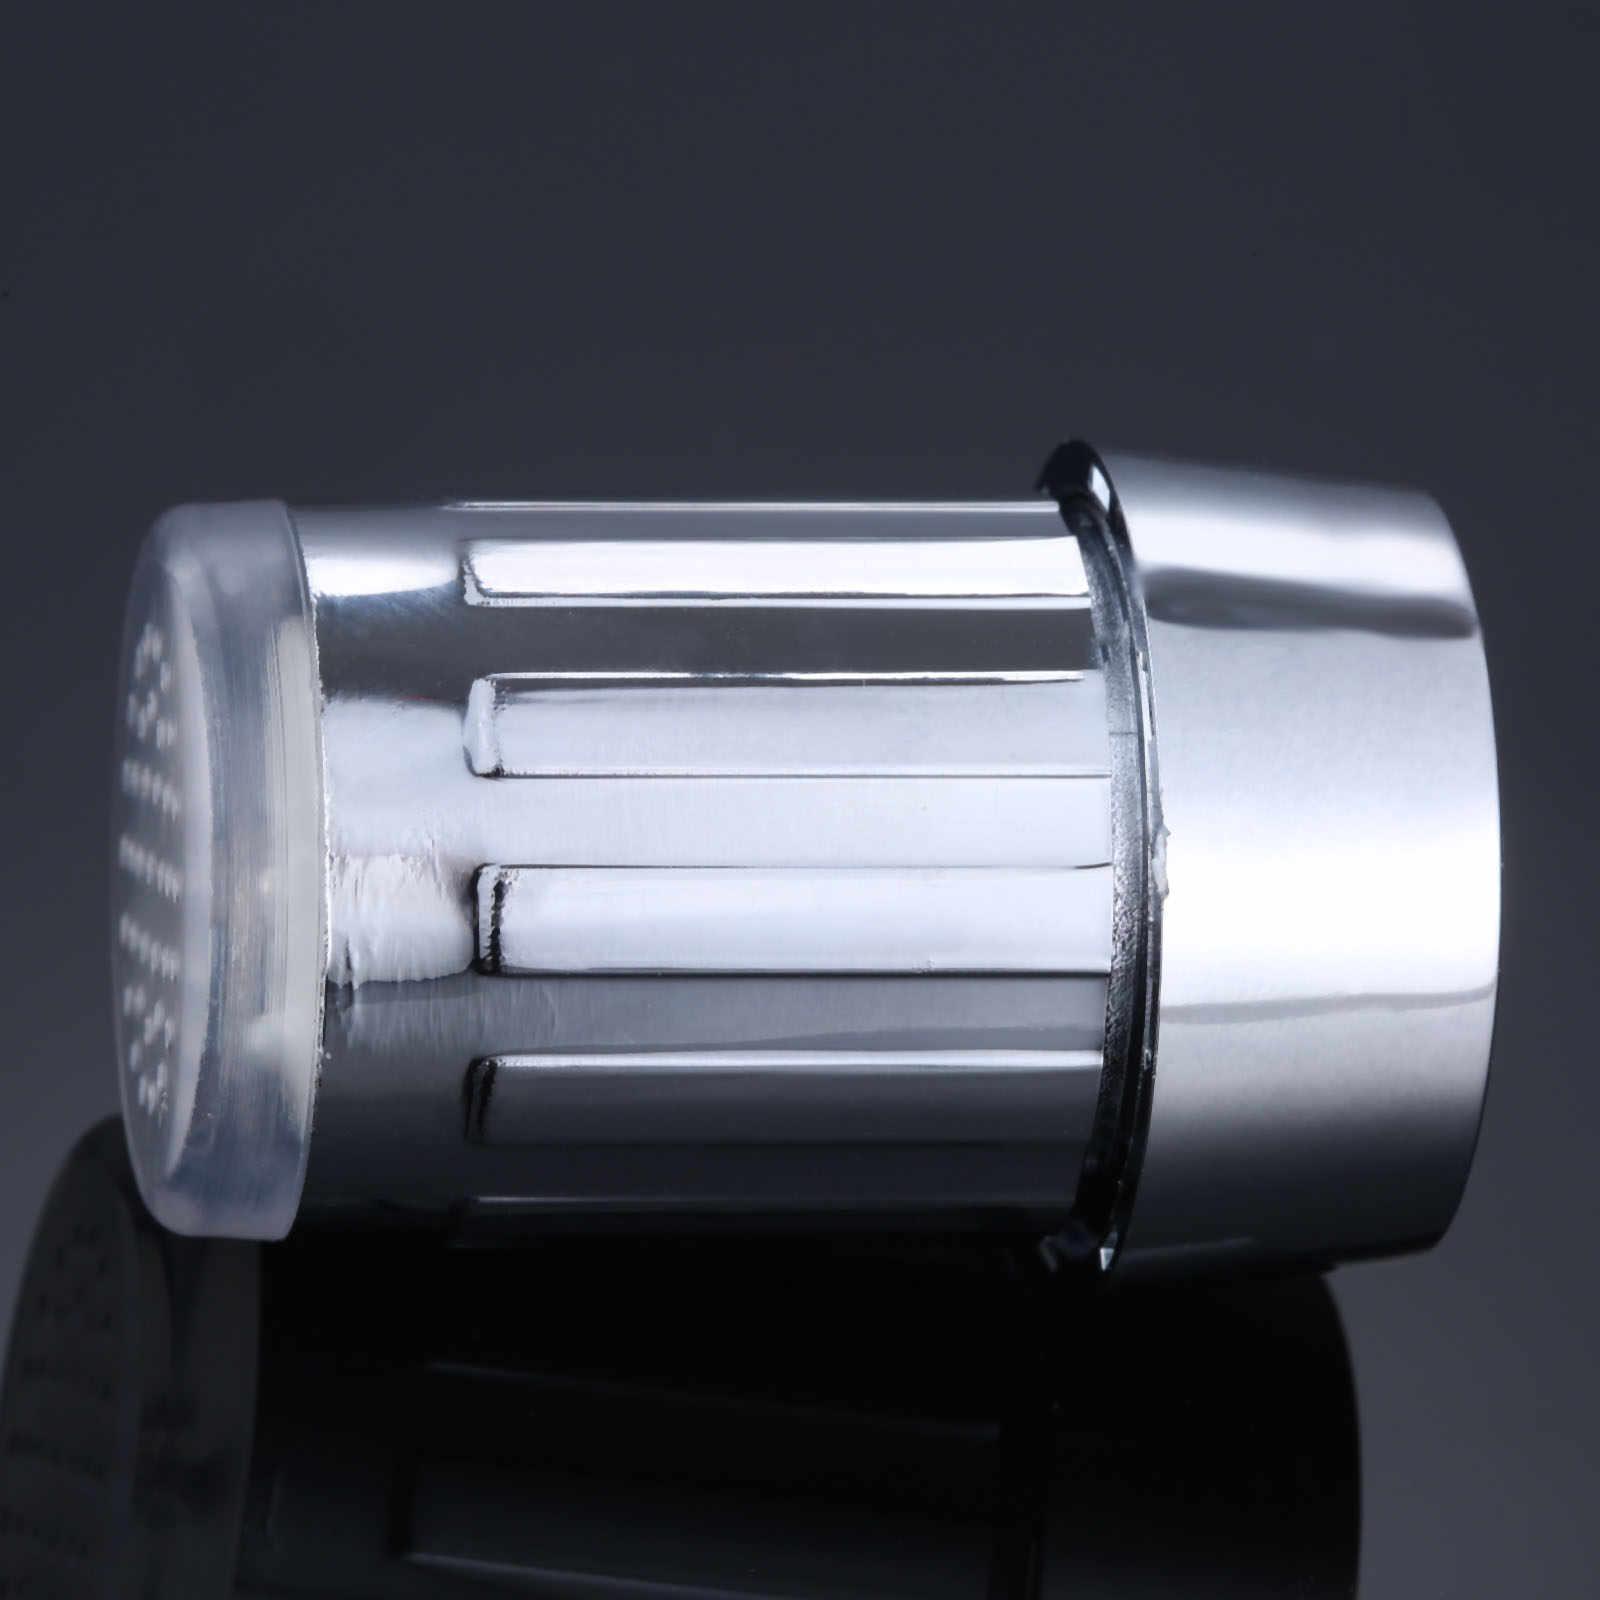 LED 水蛇口ストリームライトキッチンバスルームシャワータップ蛇口ノズルヘッド温度センサーブルーライト蛇口